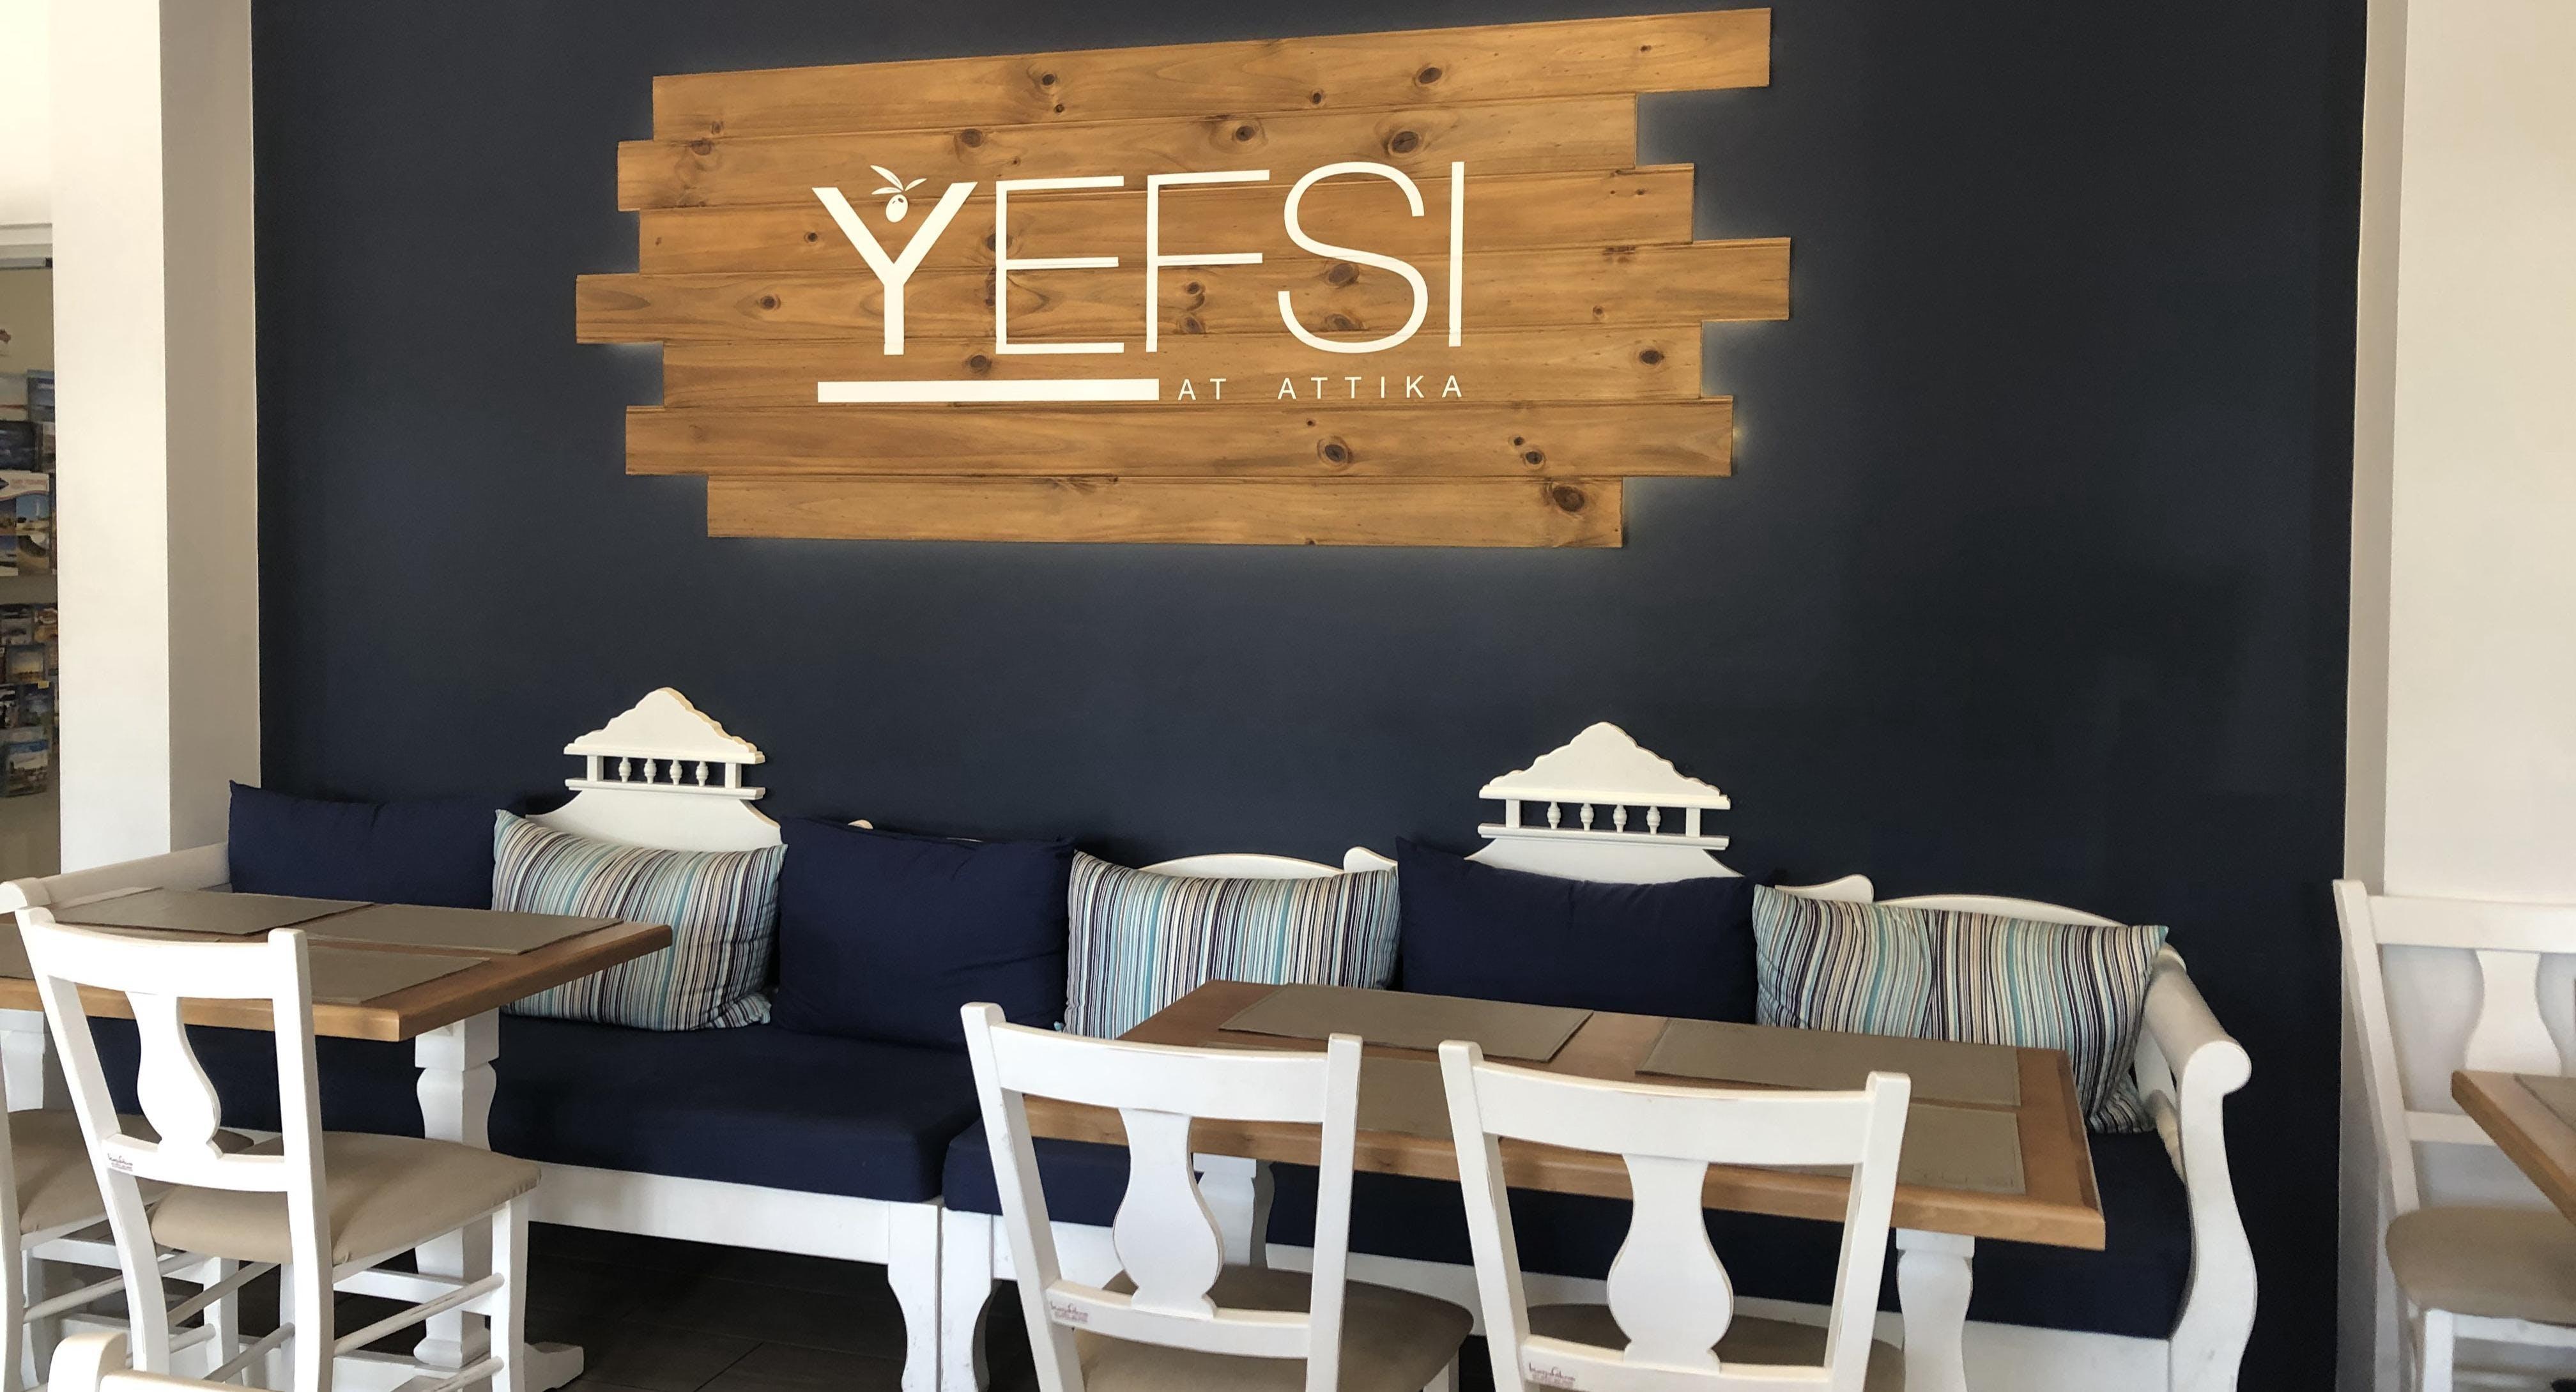 Photo of restaurant Yefsi at Attika in Northbridge, Perth